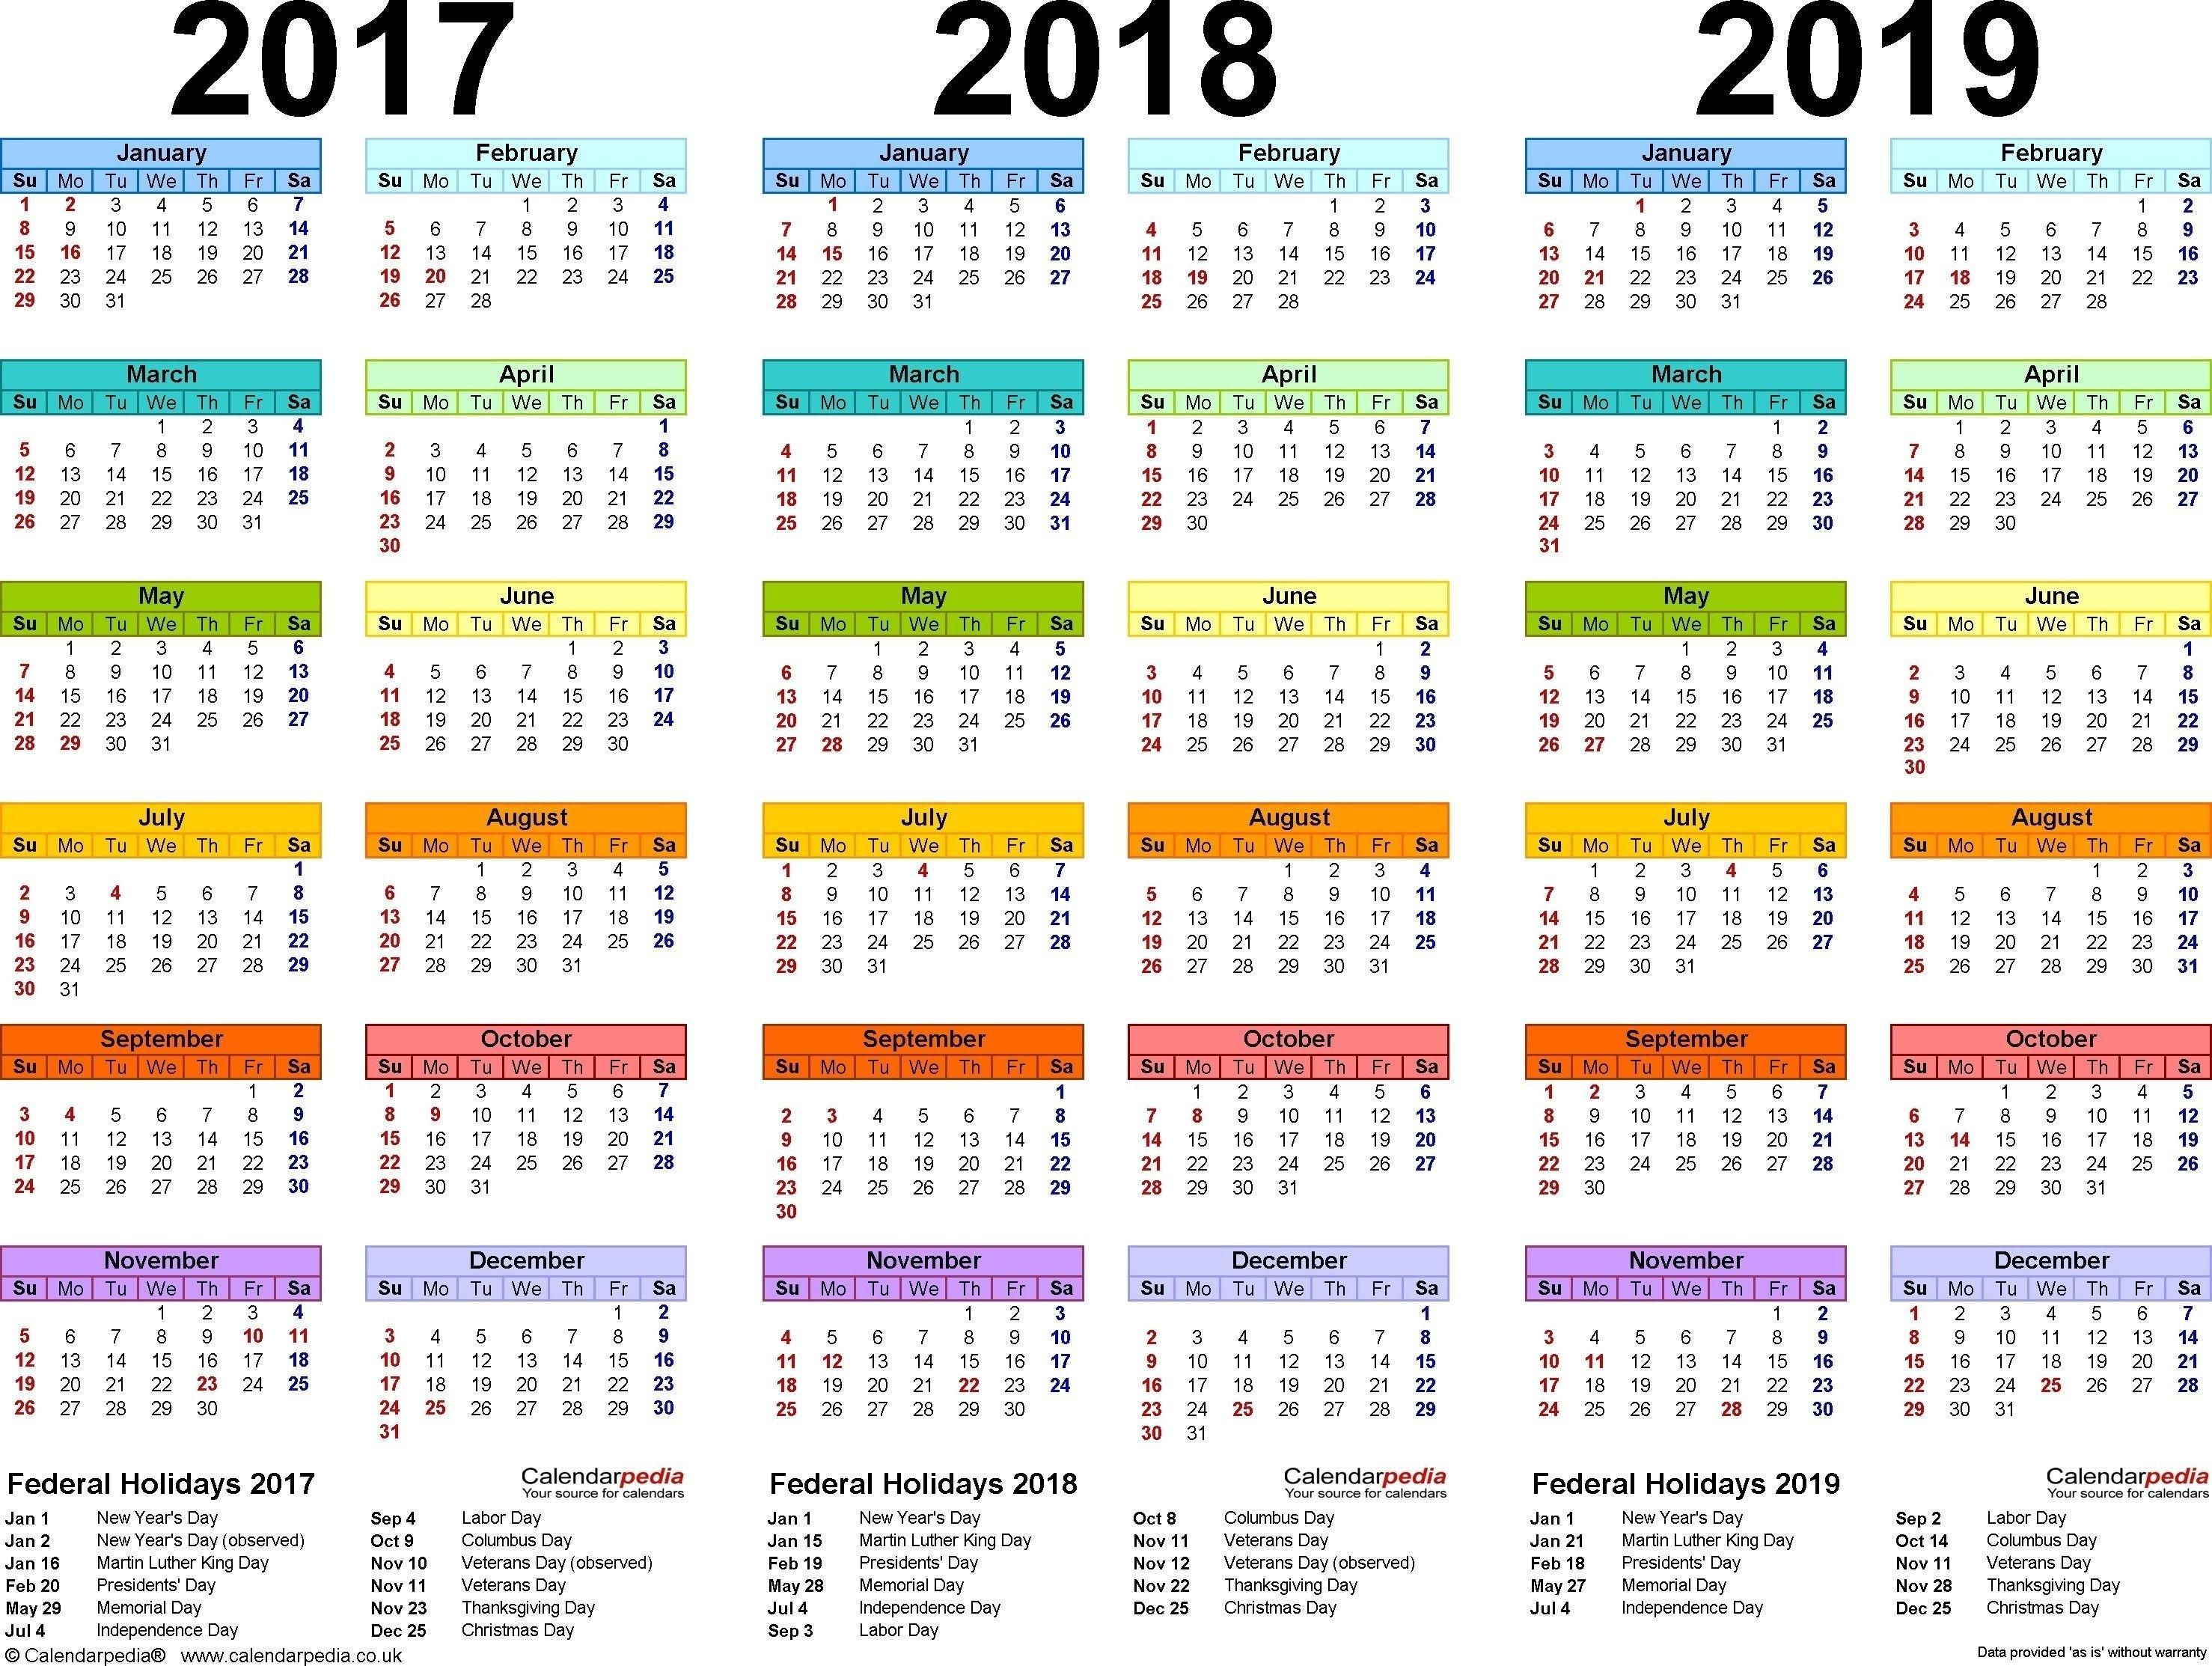 Depo Provera Printable Calendar 2019 August | Calendar  Depo Provera Monthly Calender